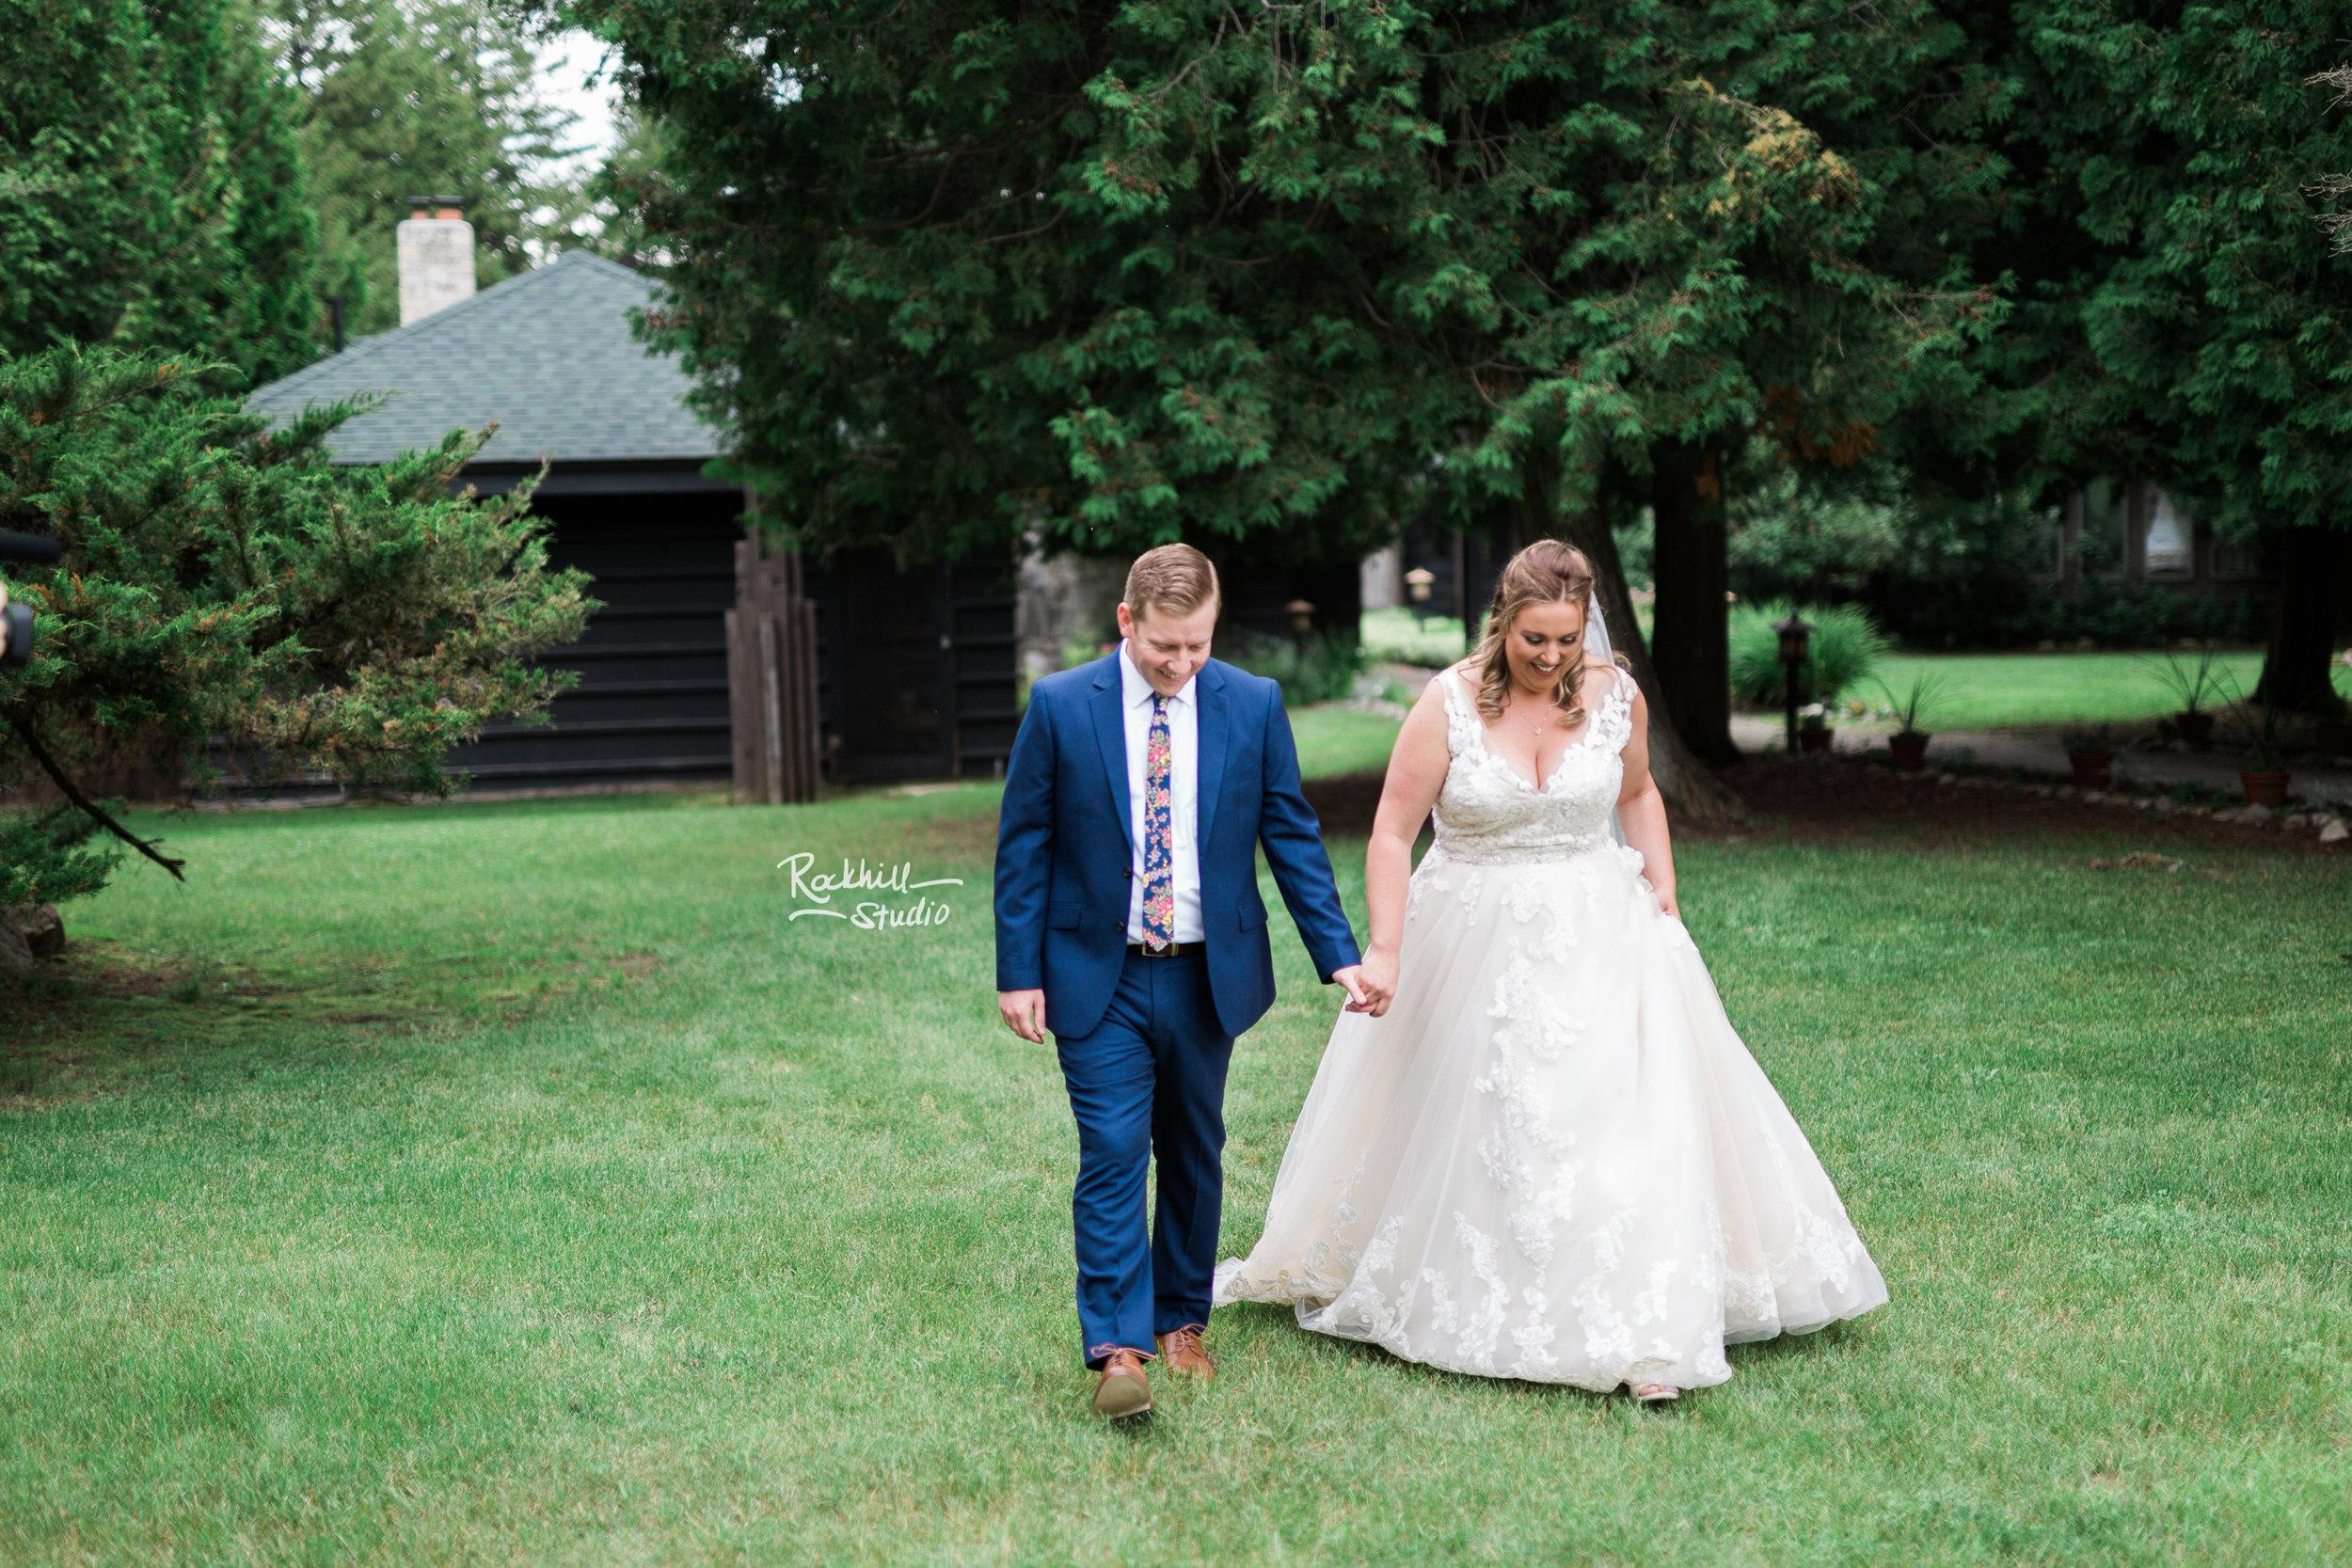 Drummond Island Wedding, Walking to the Ketubah signing, Traverse City Wedding Photographer Rockhill Studio